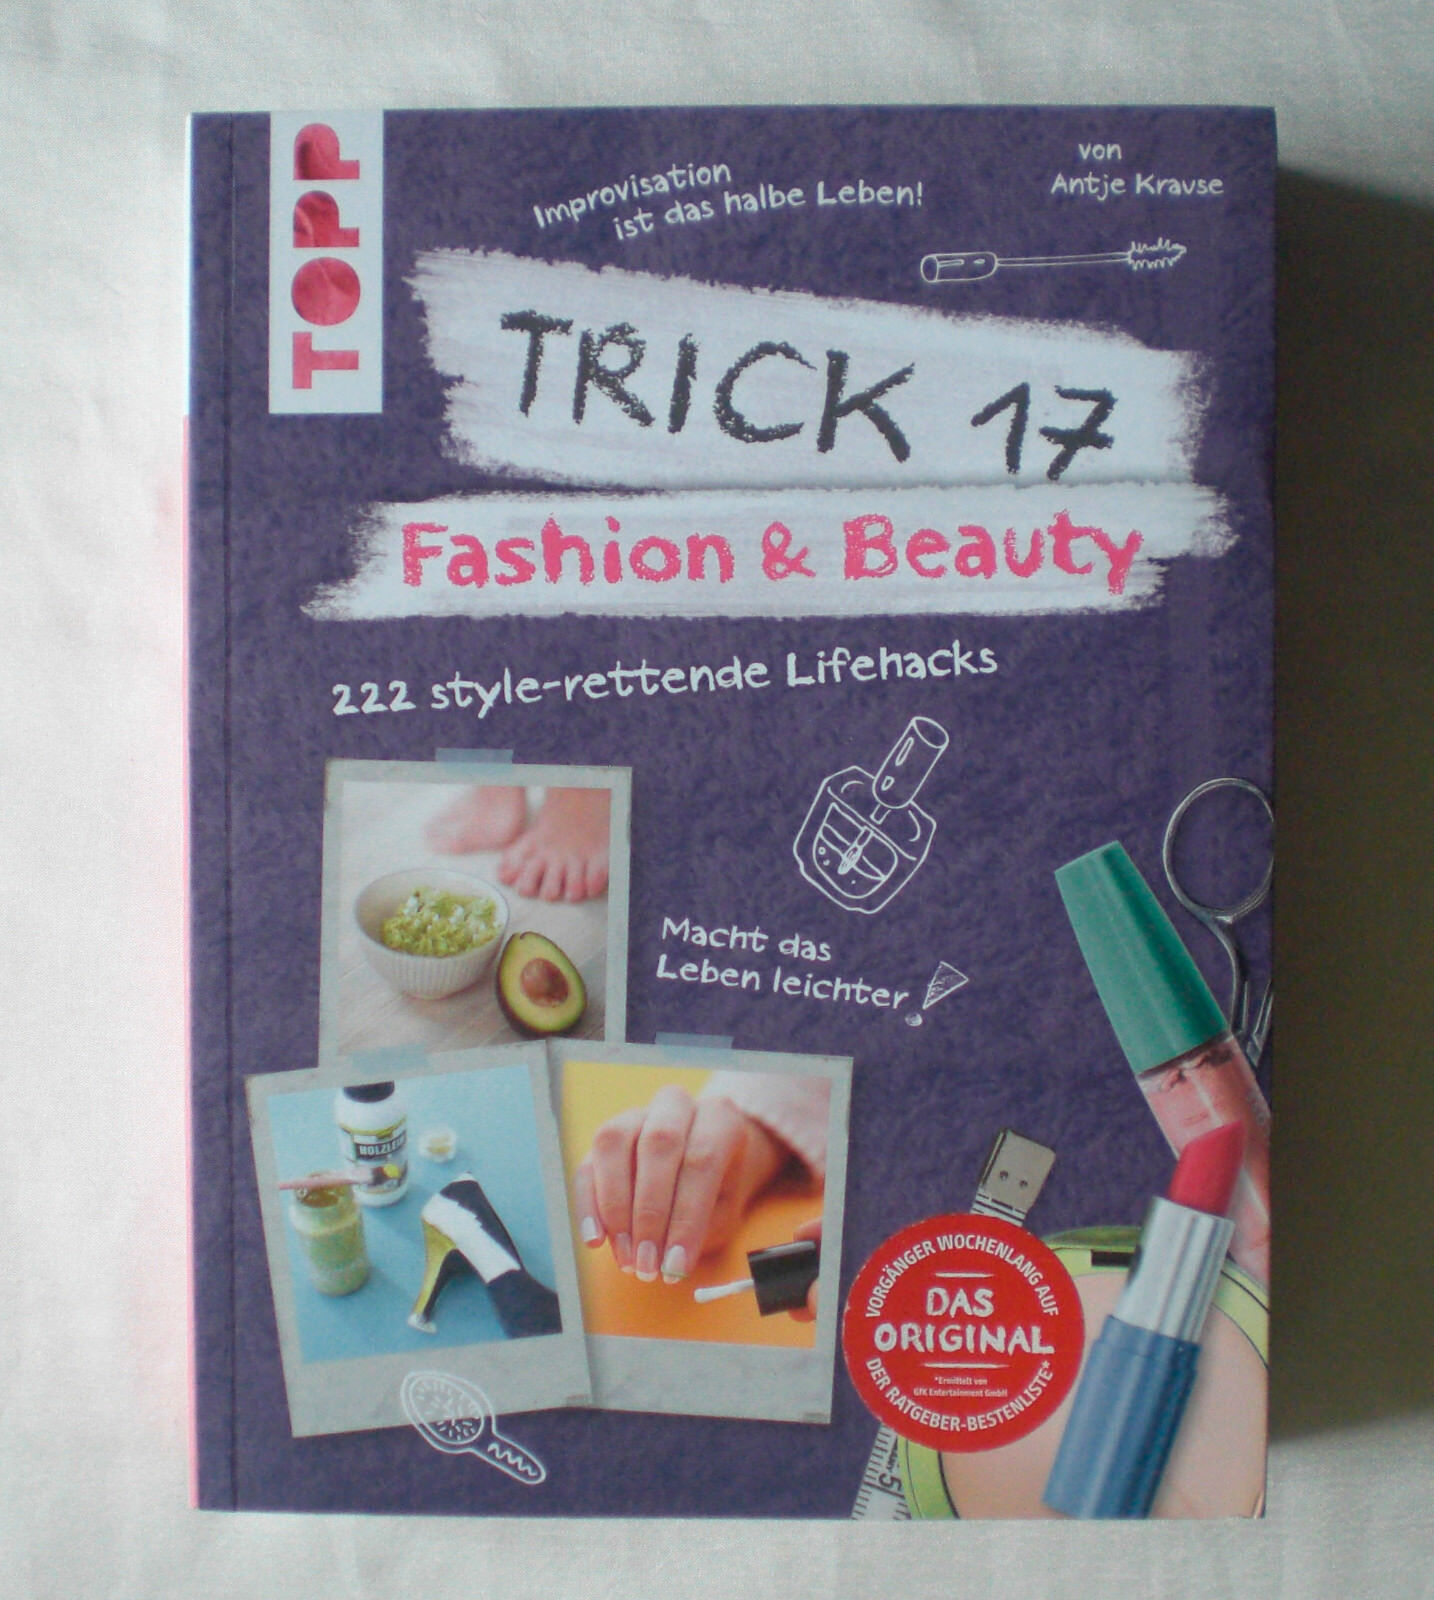 NEU Trick 17 Fashion & Beauty 222 style-rettende Lifehacks Kosmetik SchminkTipps